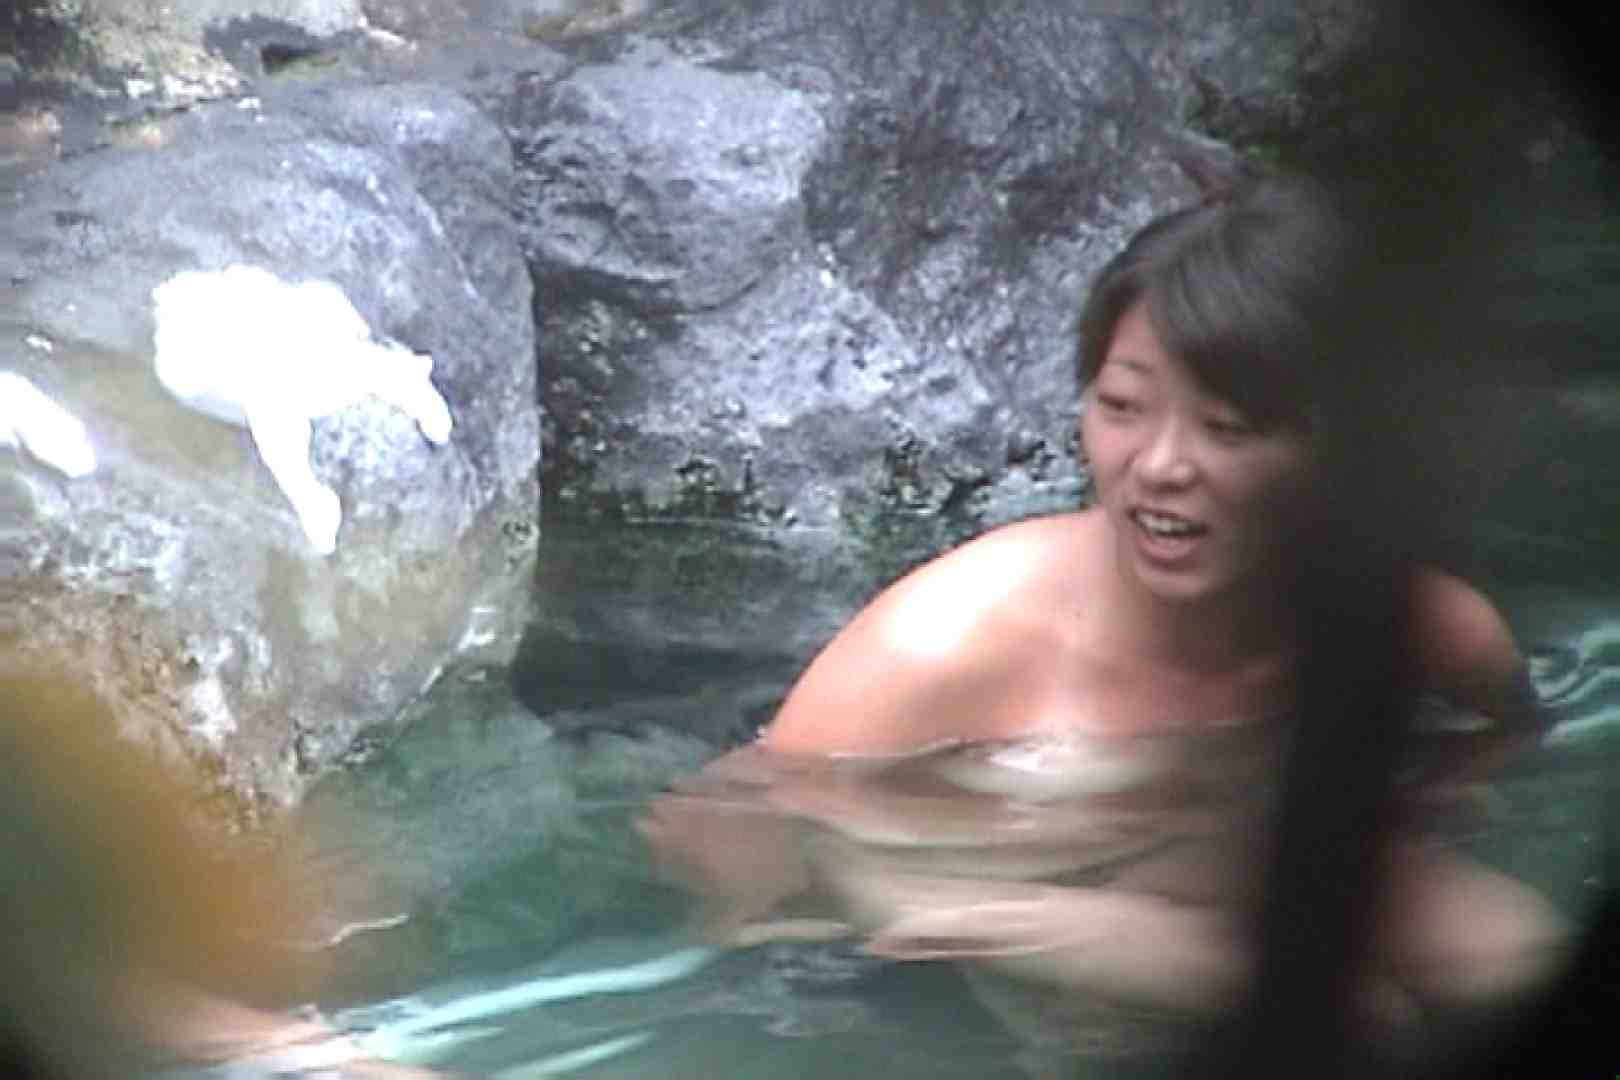 Aquaな露天風呂Vol.69【VIP限定】 OLのエロ生活   露天風呂  106連発 103